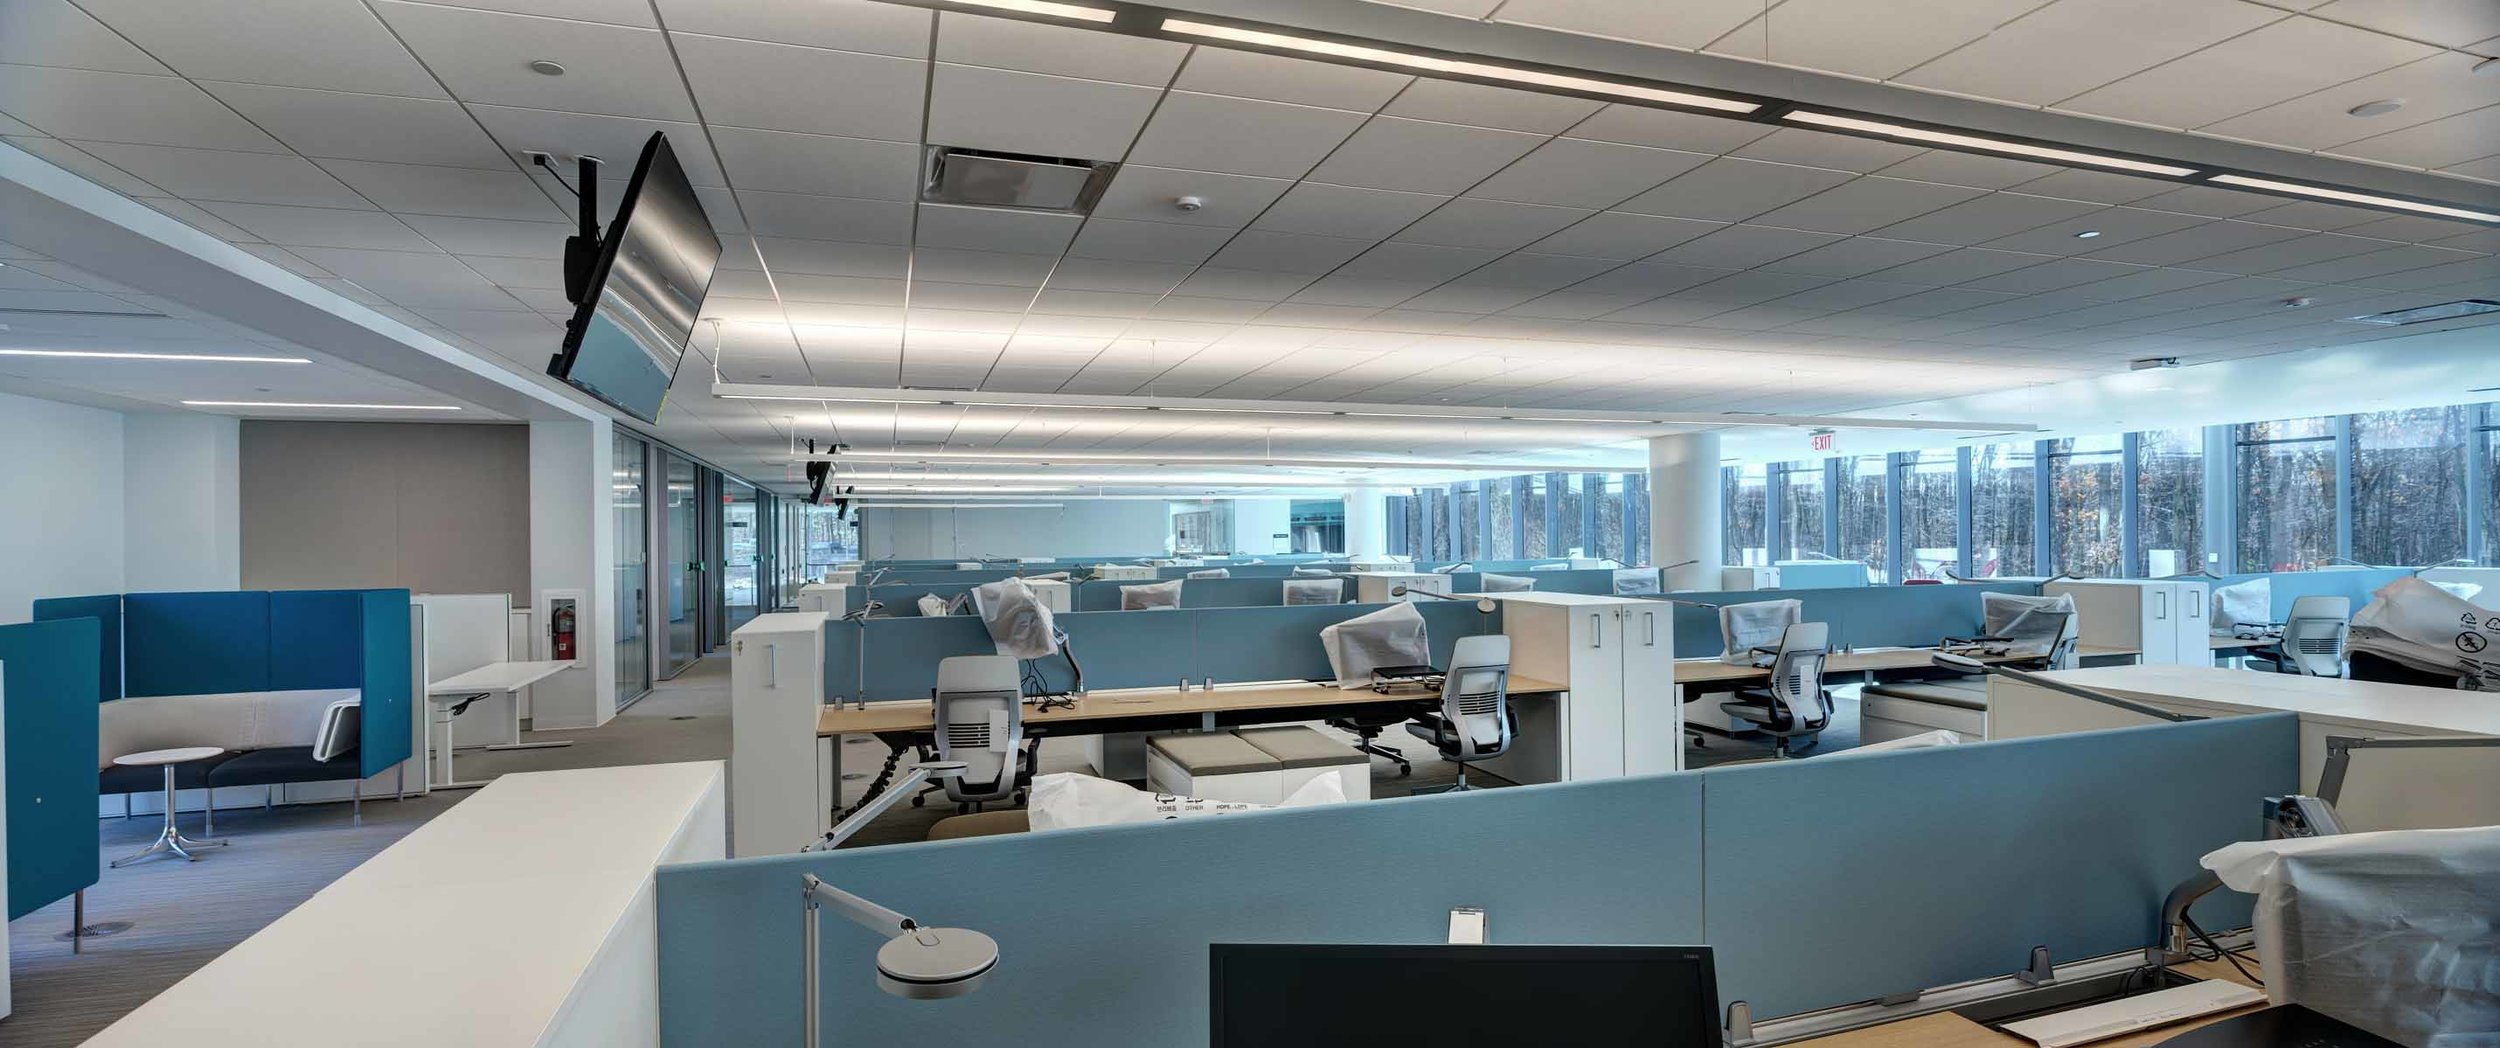 1stFloor-Offices-9832-ConsumersCreditUnion-QuarterSize[1].jpg